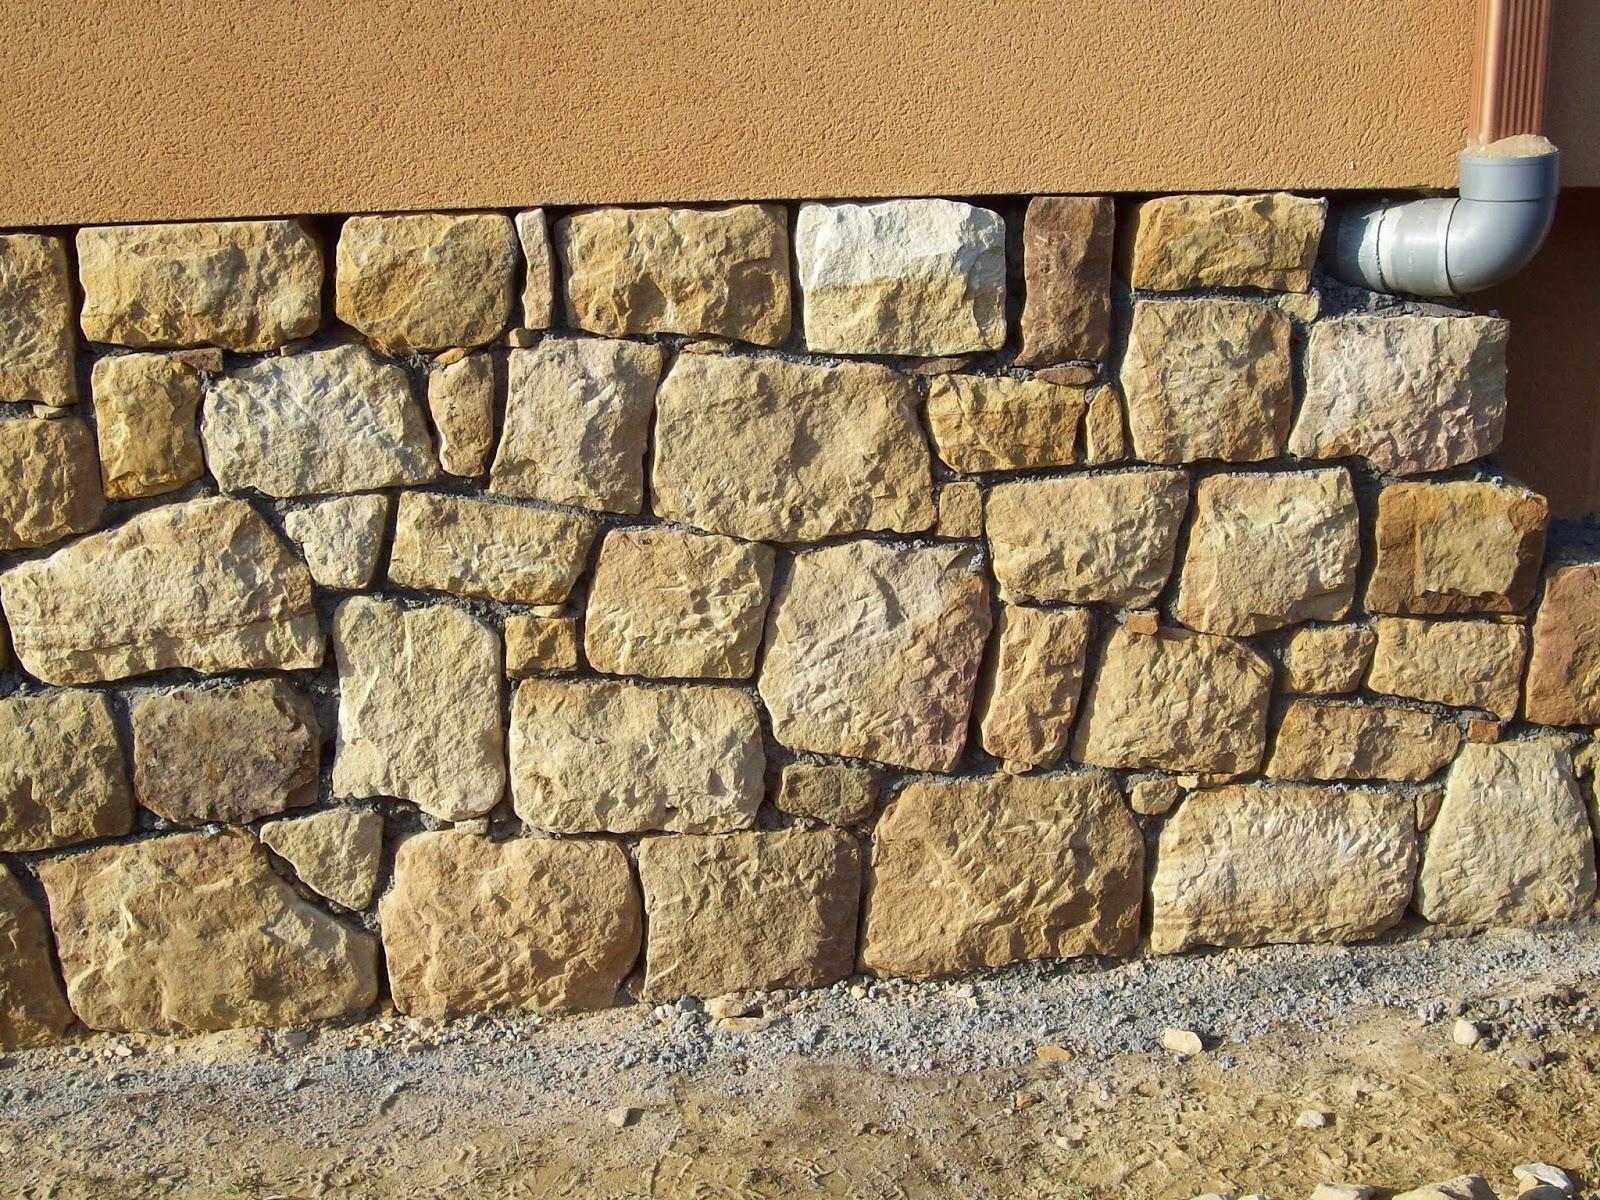 Canteria artesanal los muros de piedra canteriartesanal - Piedra de silleria ...